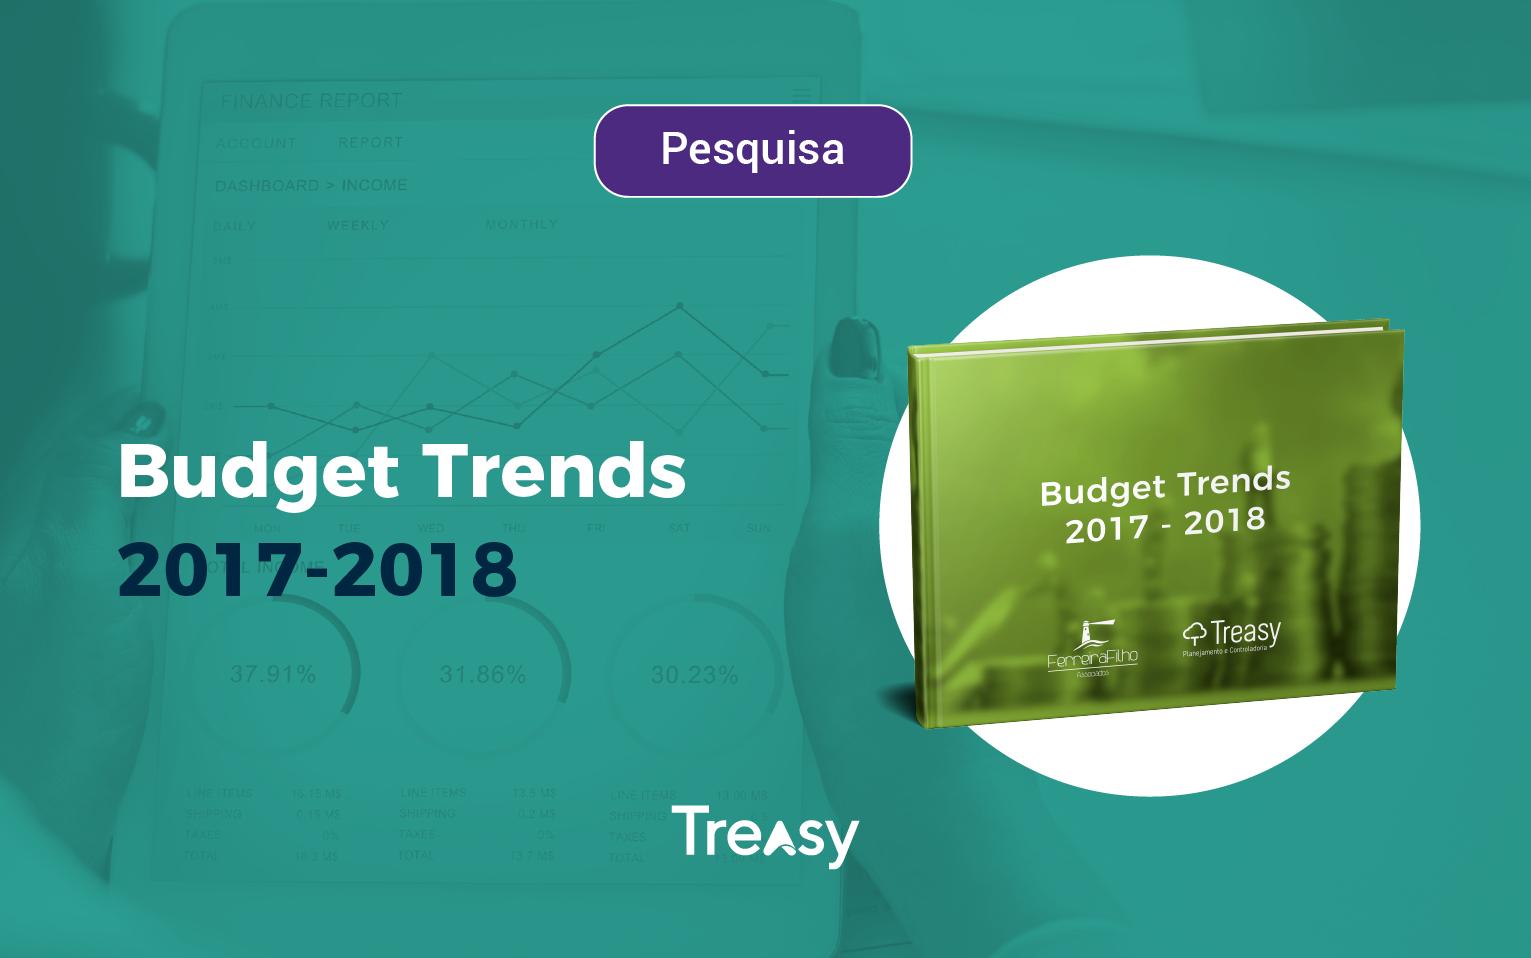 Pesquisa Budget Trends 2017 - 2018